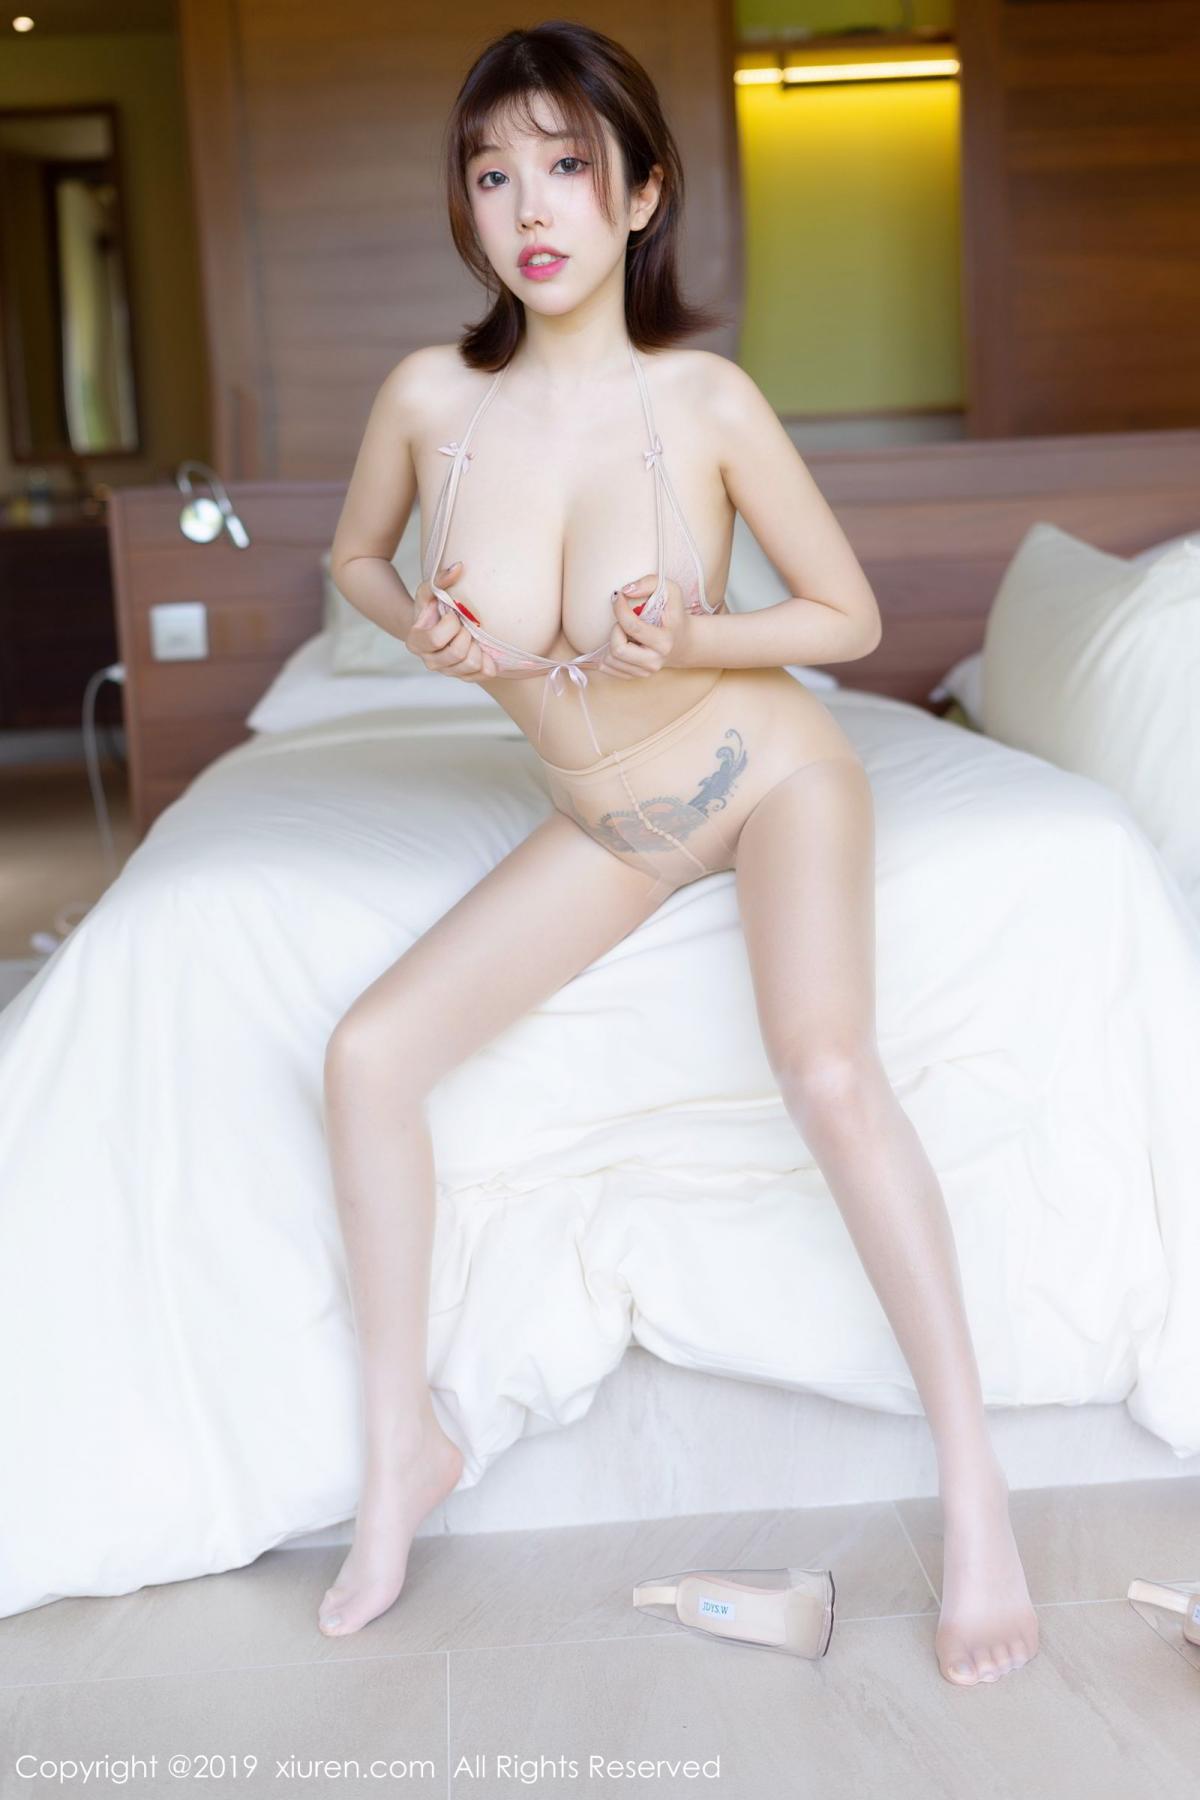 [XiuRen] Vol.1671 Huang Le Ran 11P, Adult, Huang Le Ran, Underwear, Xiuren